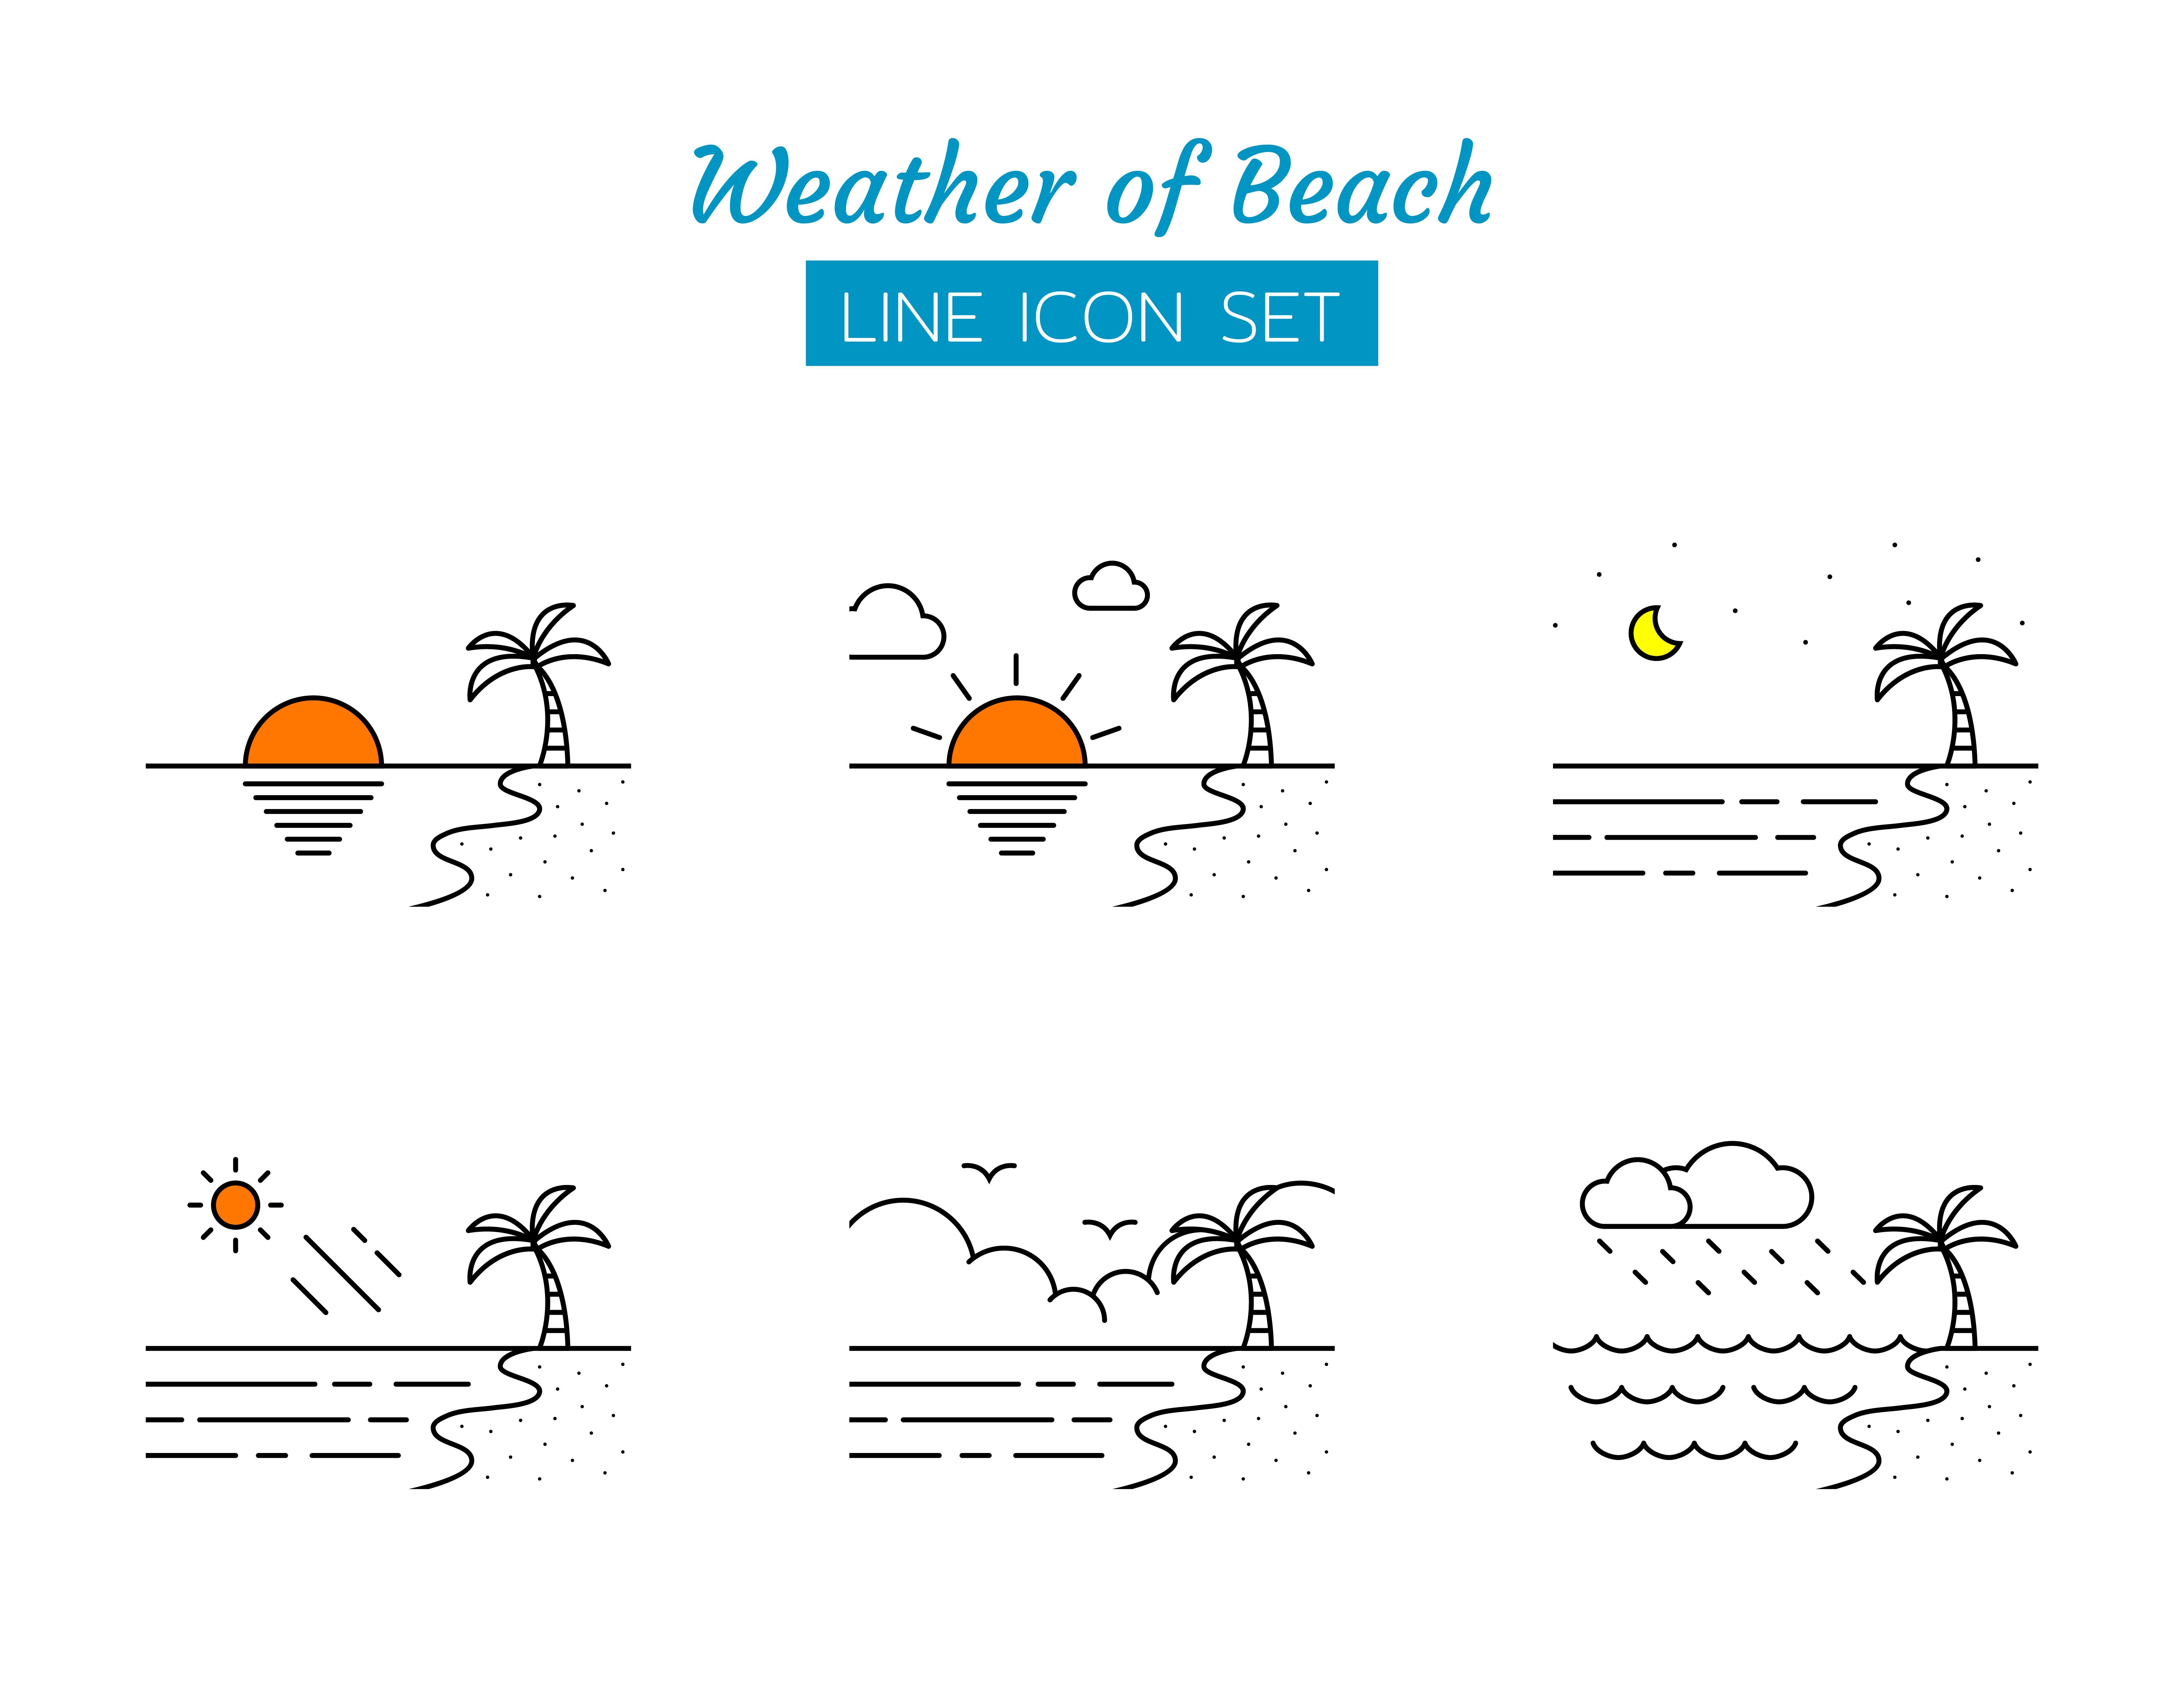 Beach weather line icon symbol set